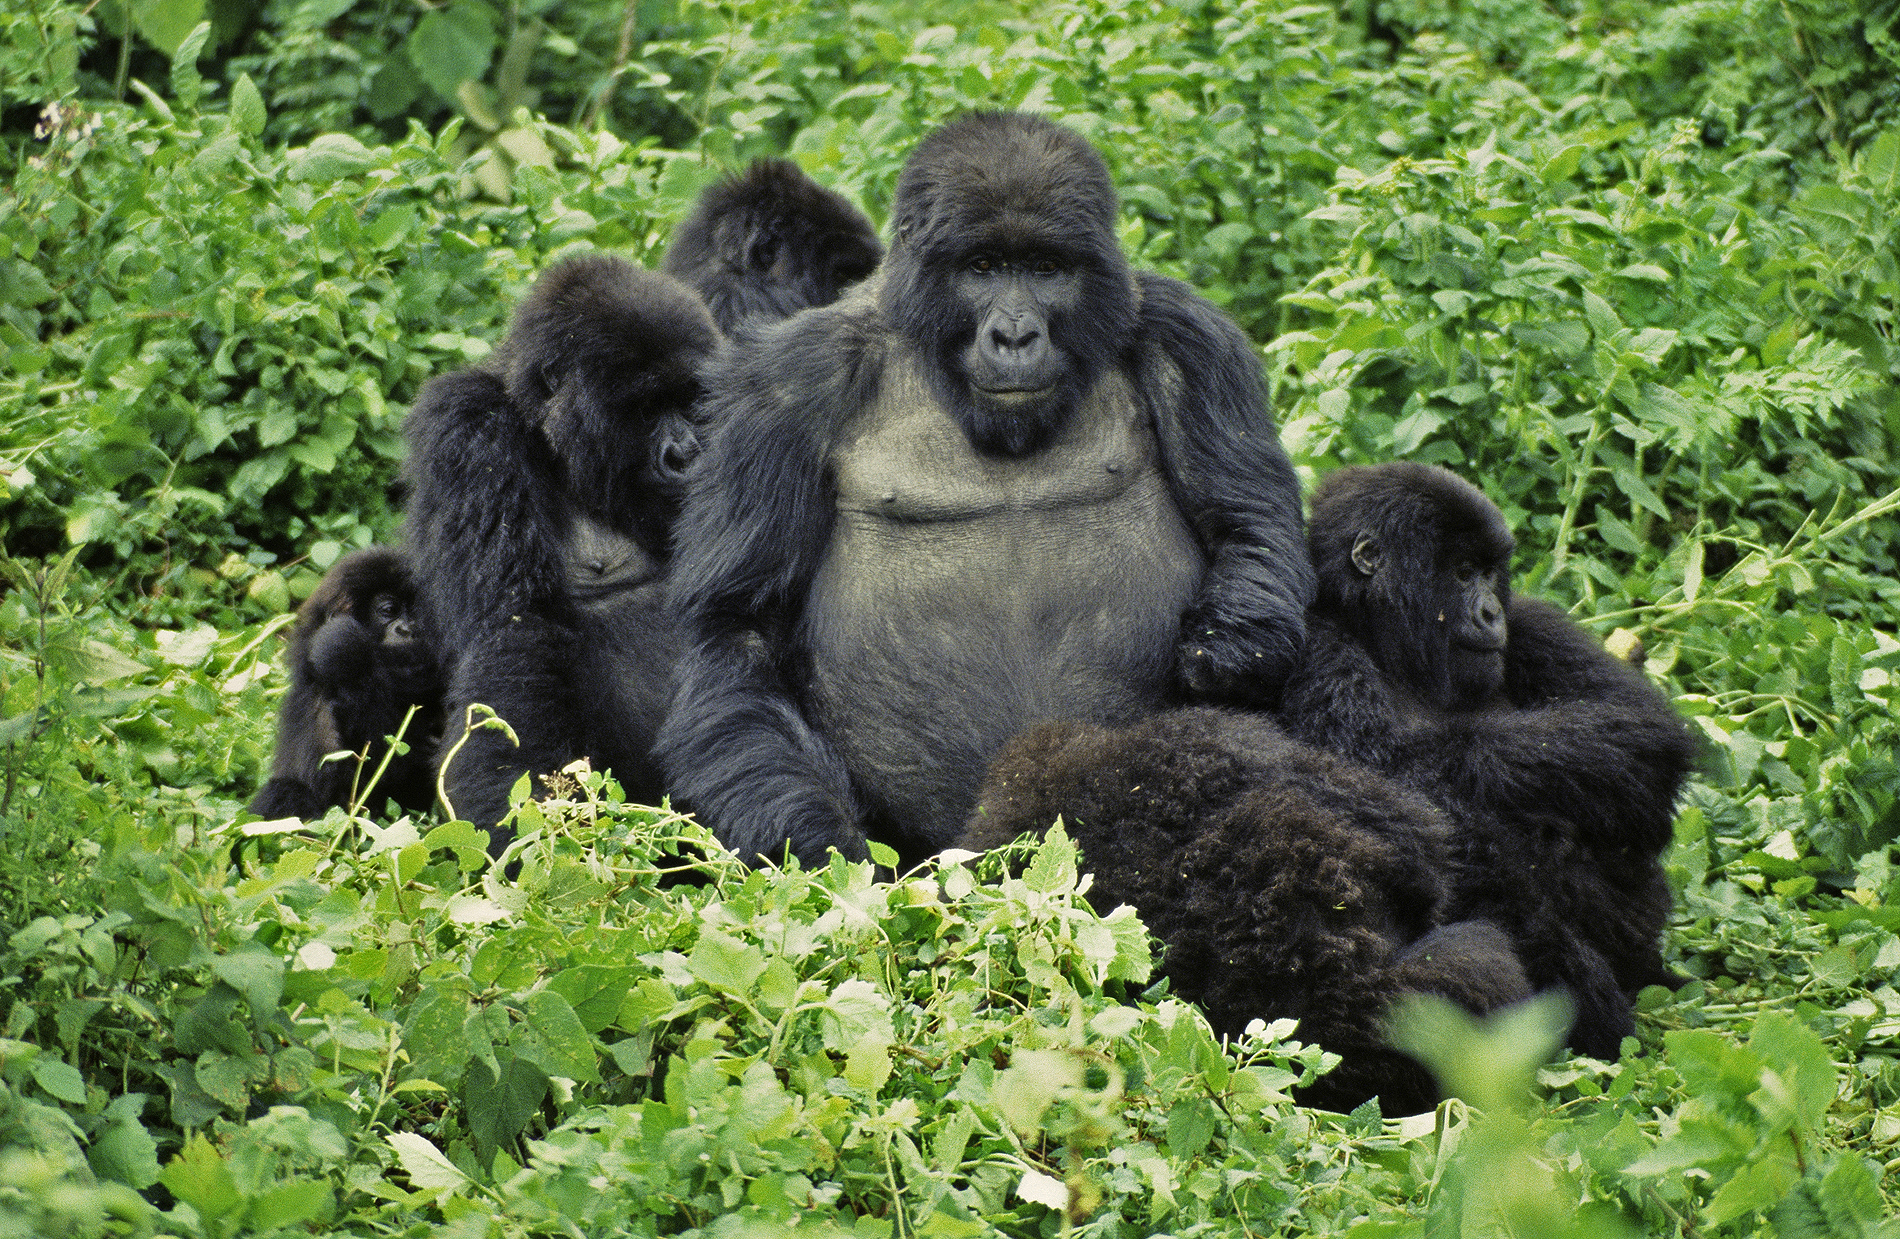 FAMILY PORTRAIT (Gorilla gorilla beringei)